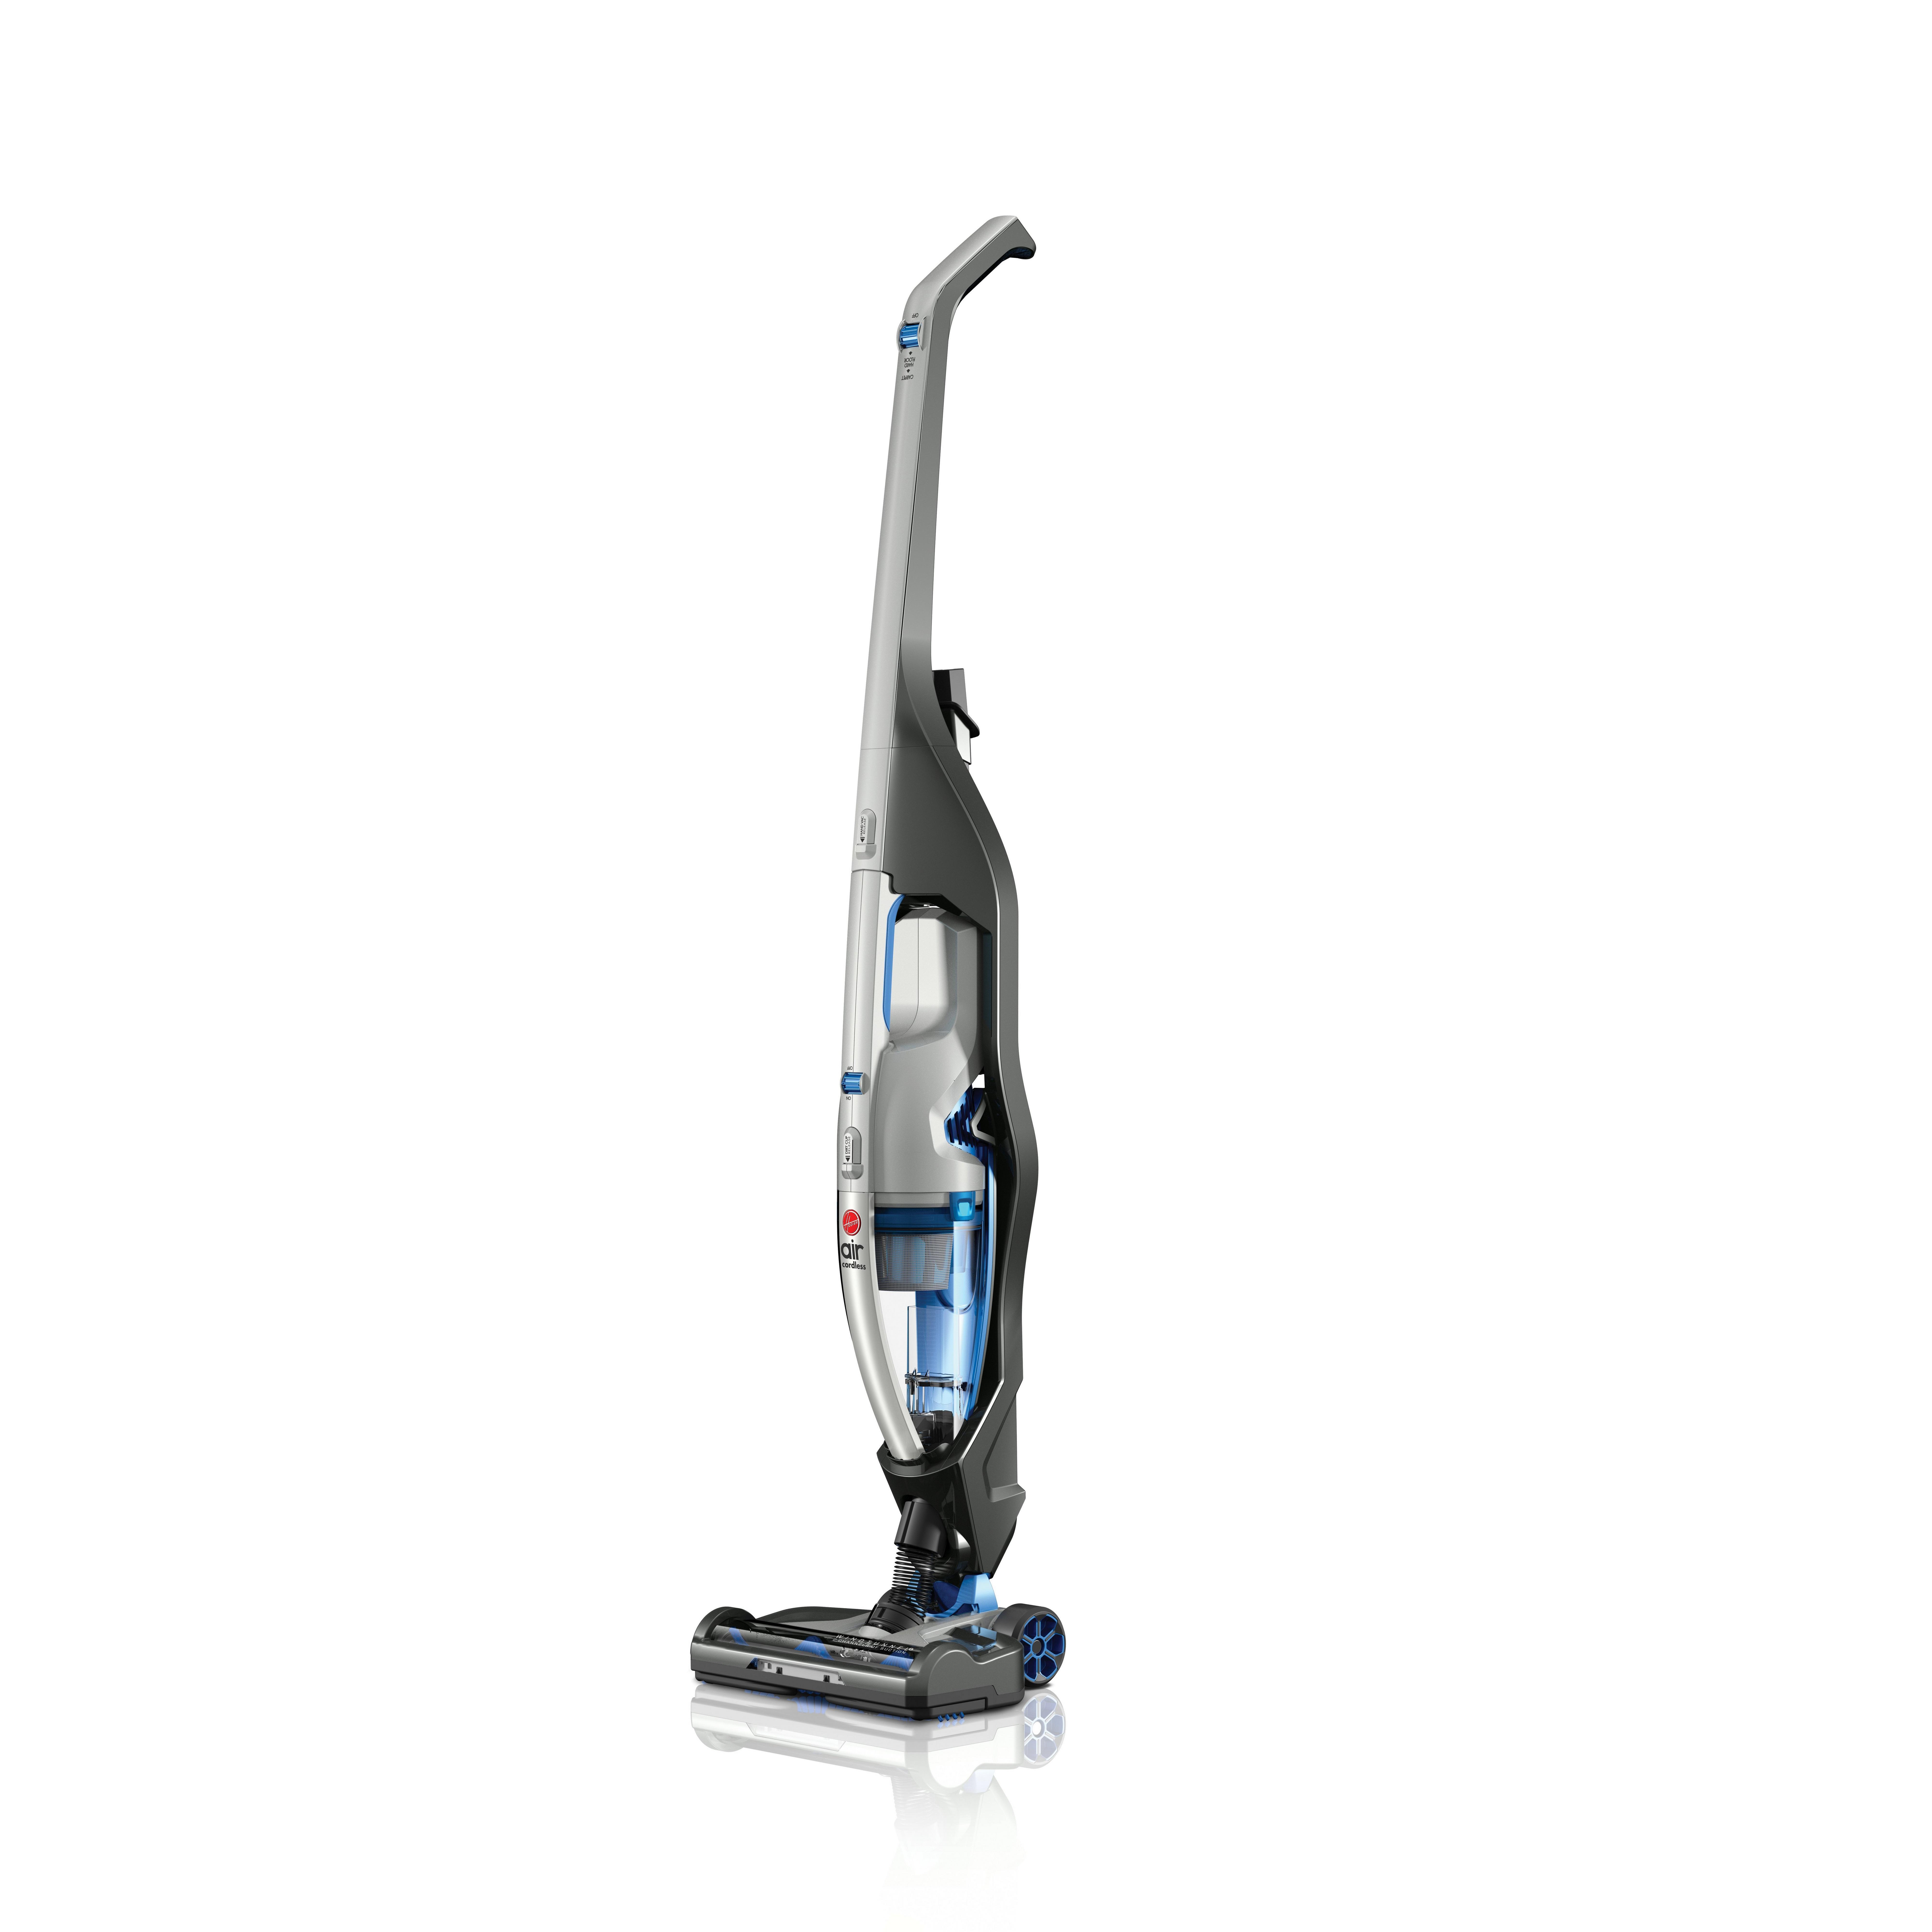 Air Cordless 2-in-1 Stick & Handheld Vacuum2